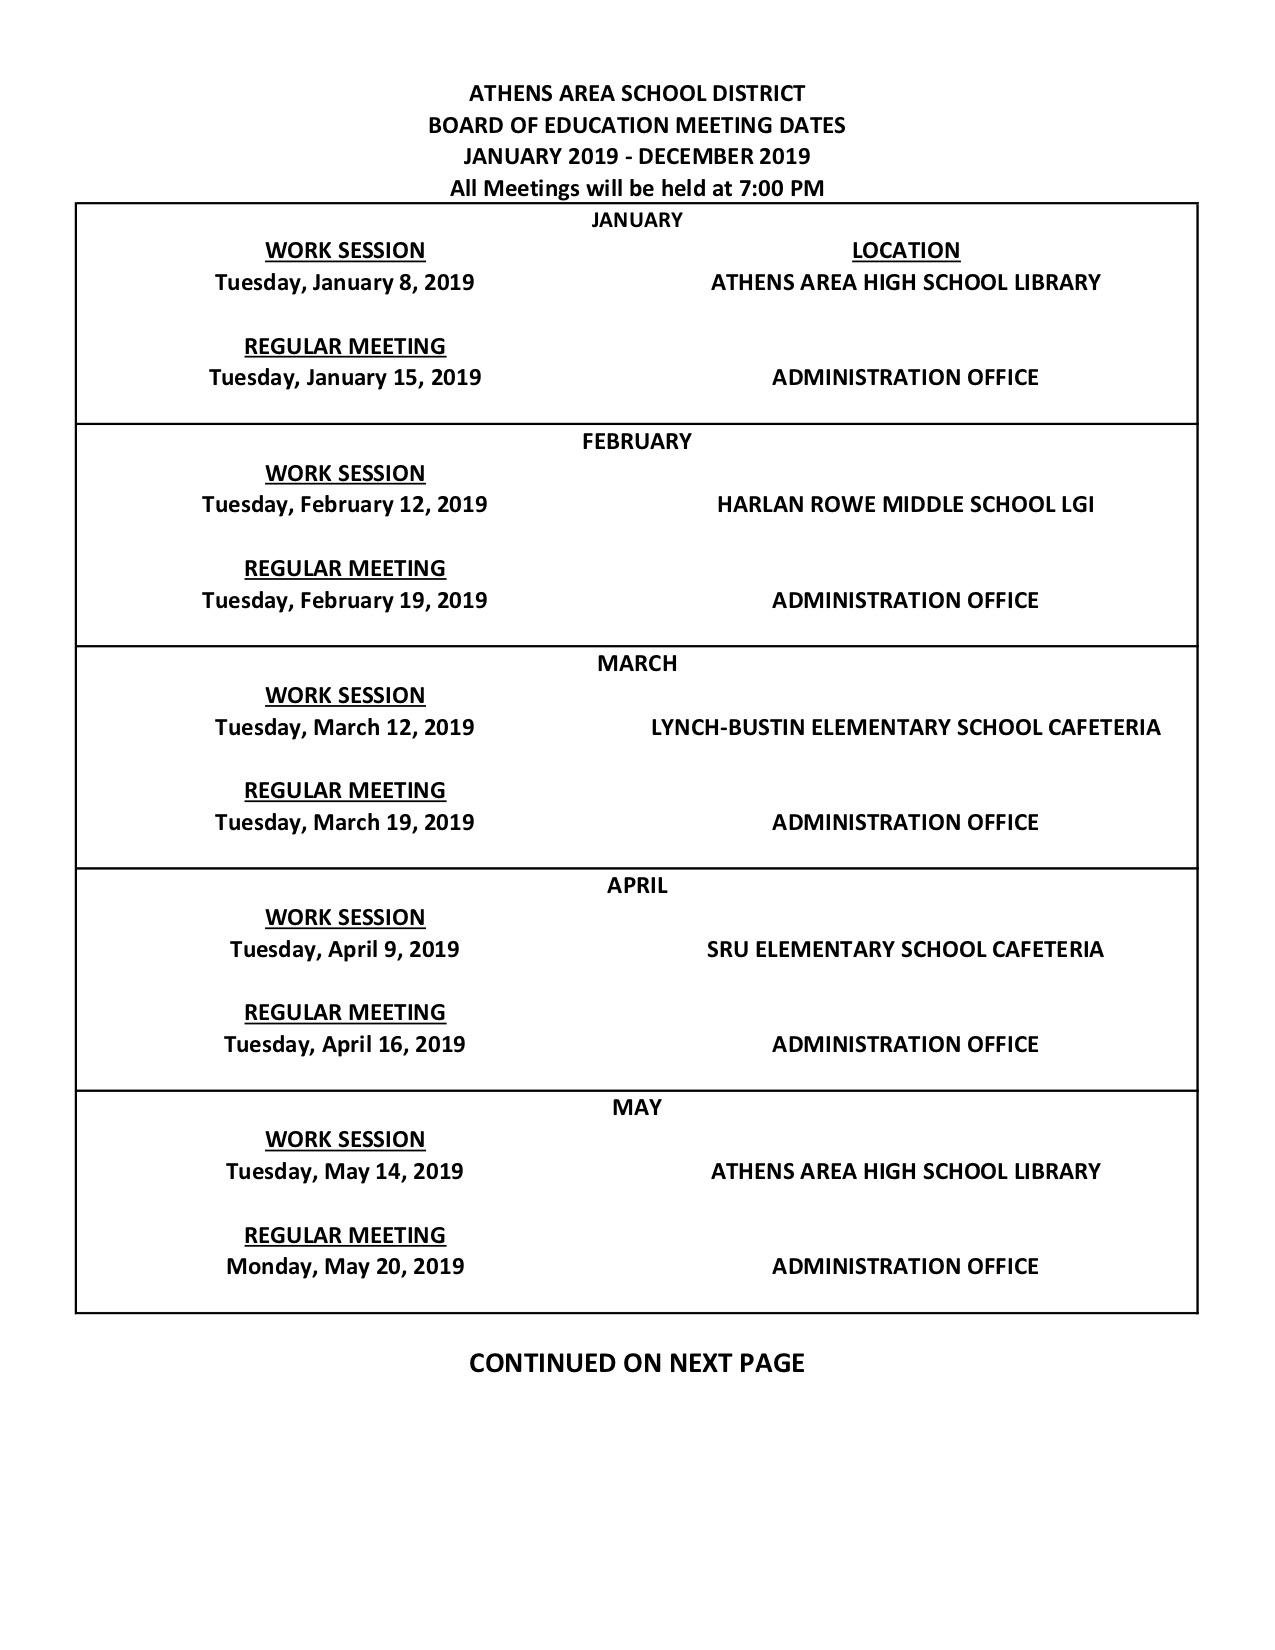 Jan/Jun Board Meeting Dates